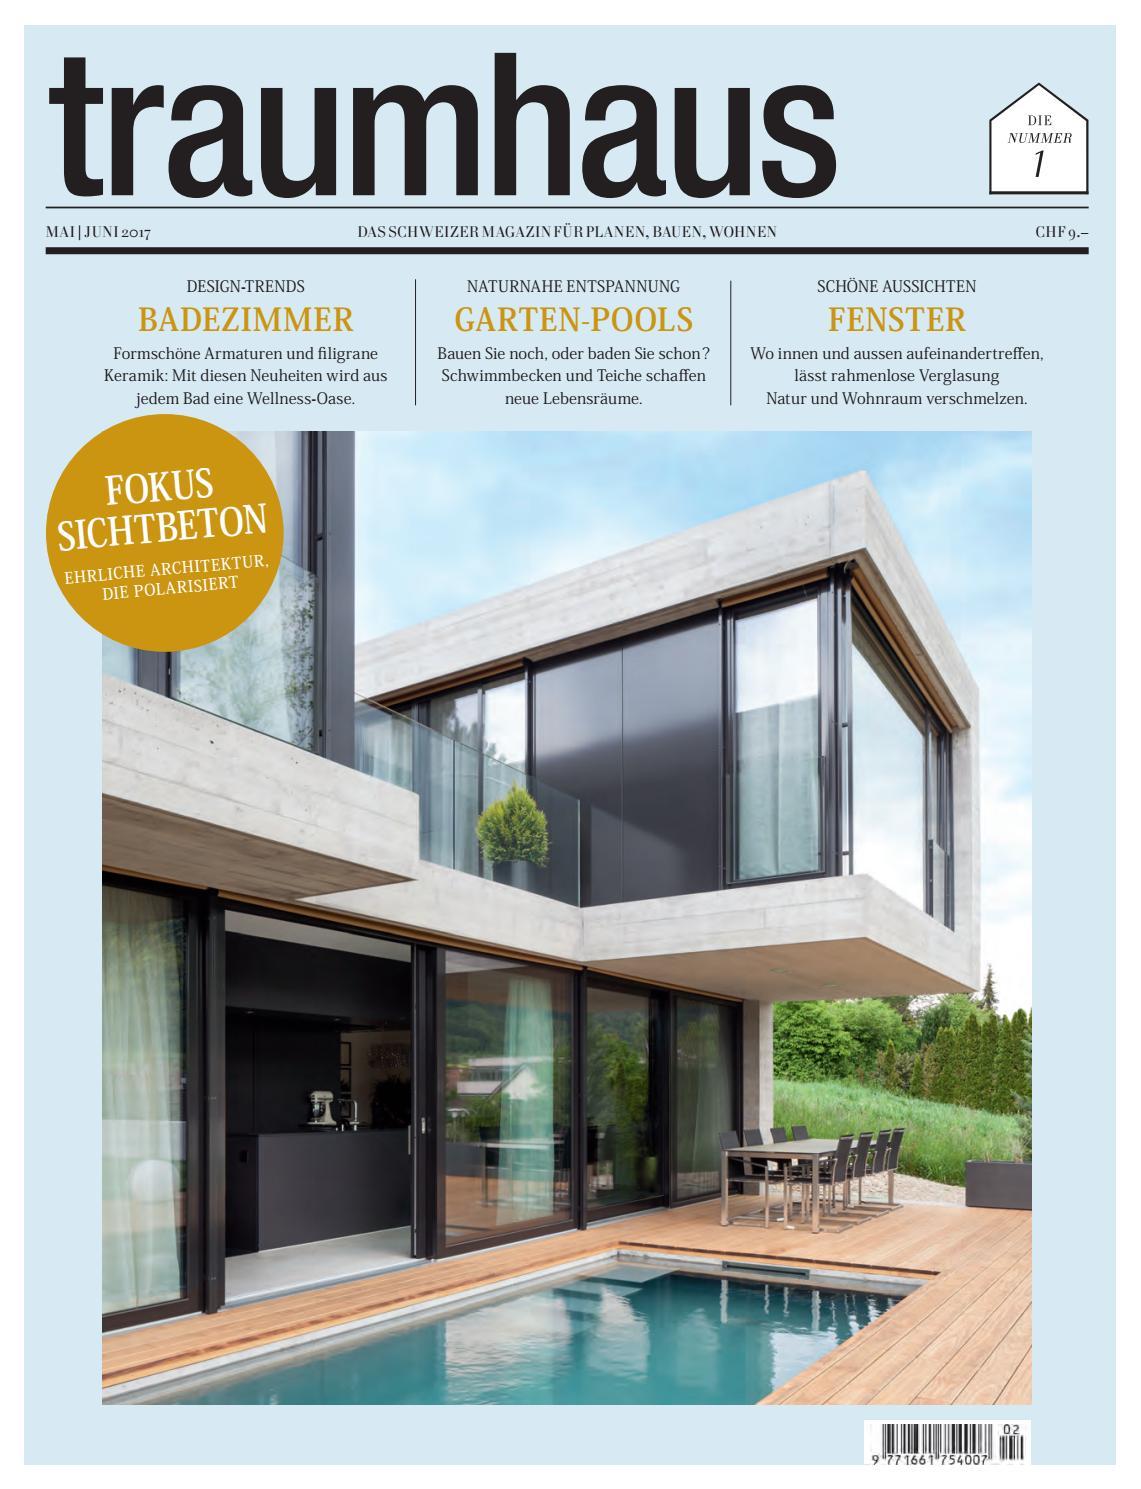 traumhaus 02 2017 by BL Verlag AG - issuu